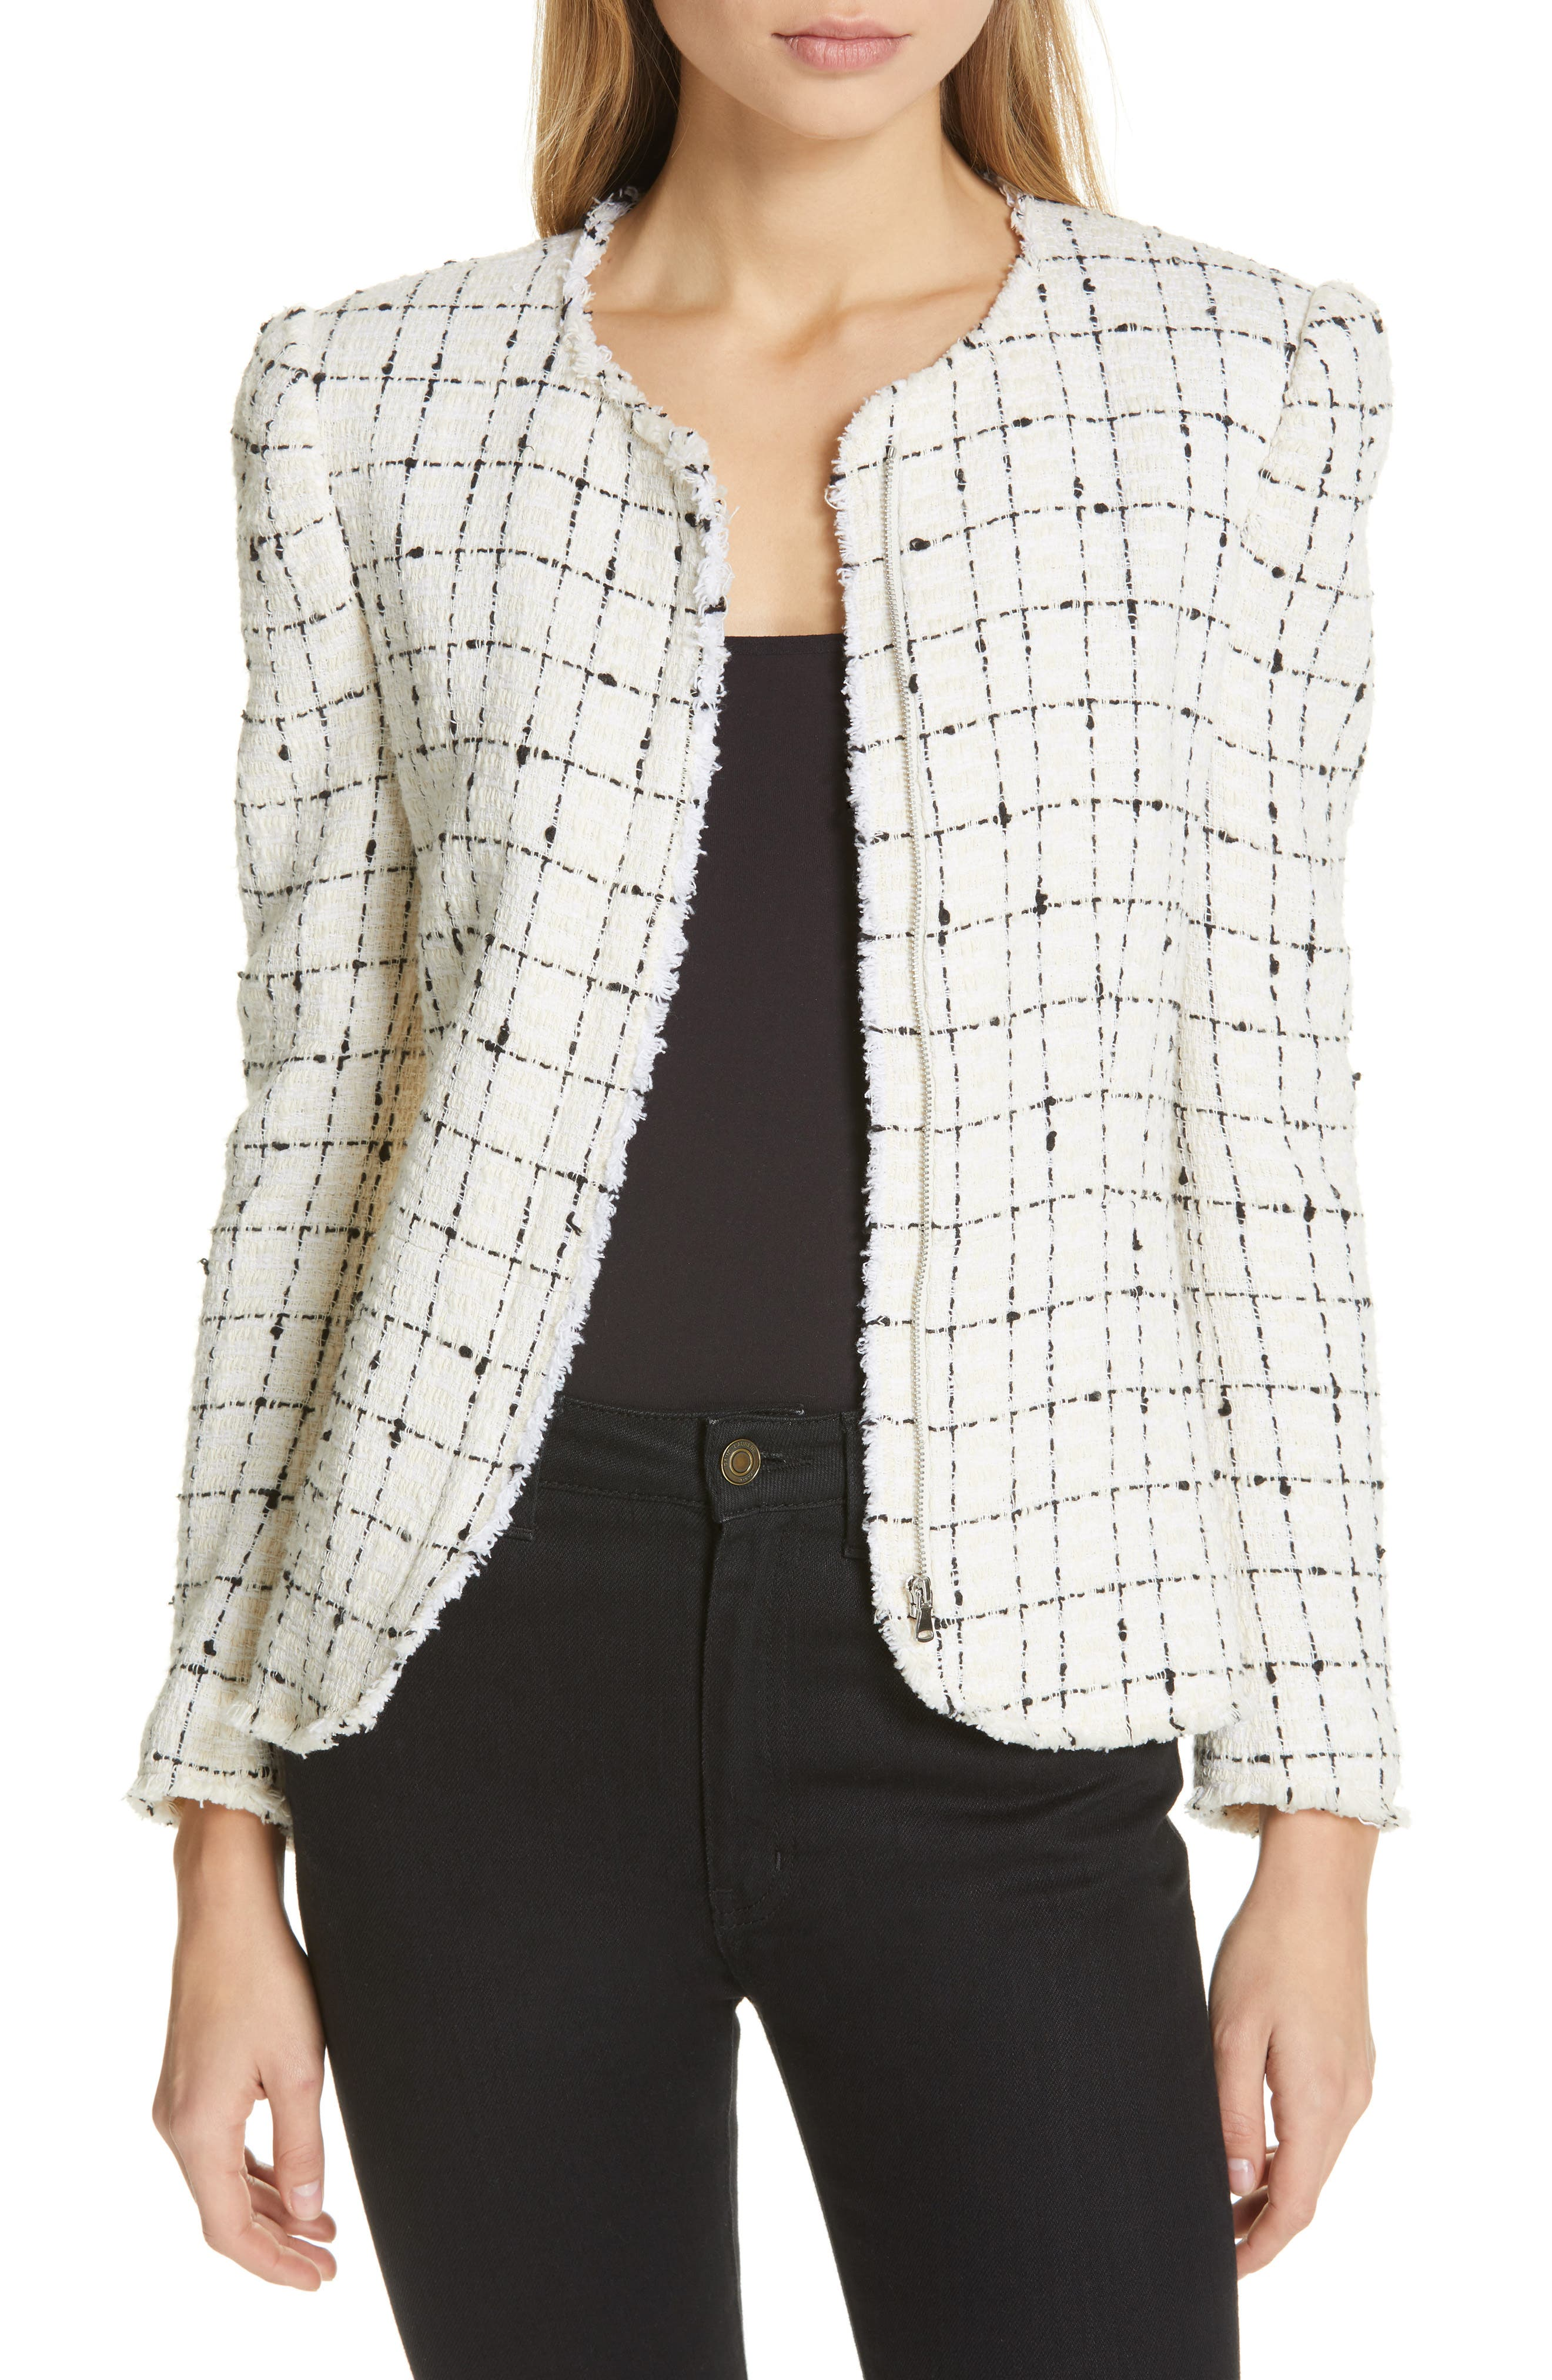 REBECCA TAYLOR, Plaid Tweed Zip Jacket, Main thumbnail 1, color, CREAM COMBO